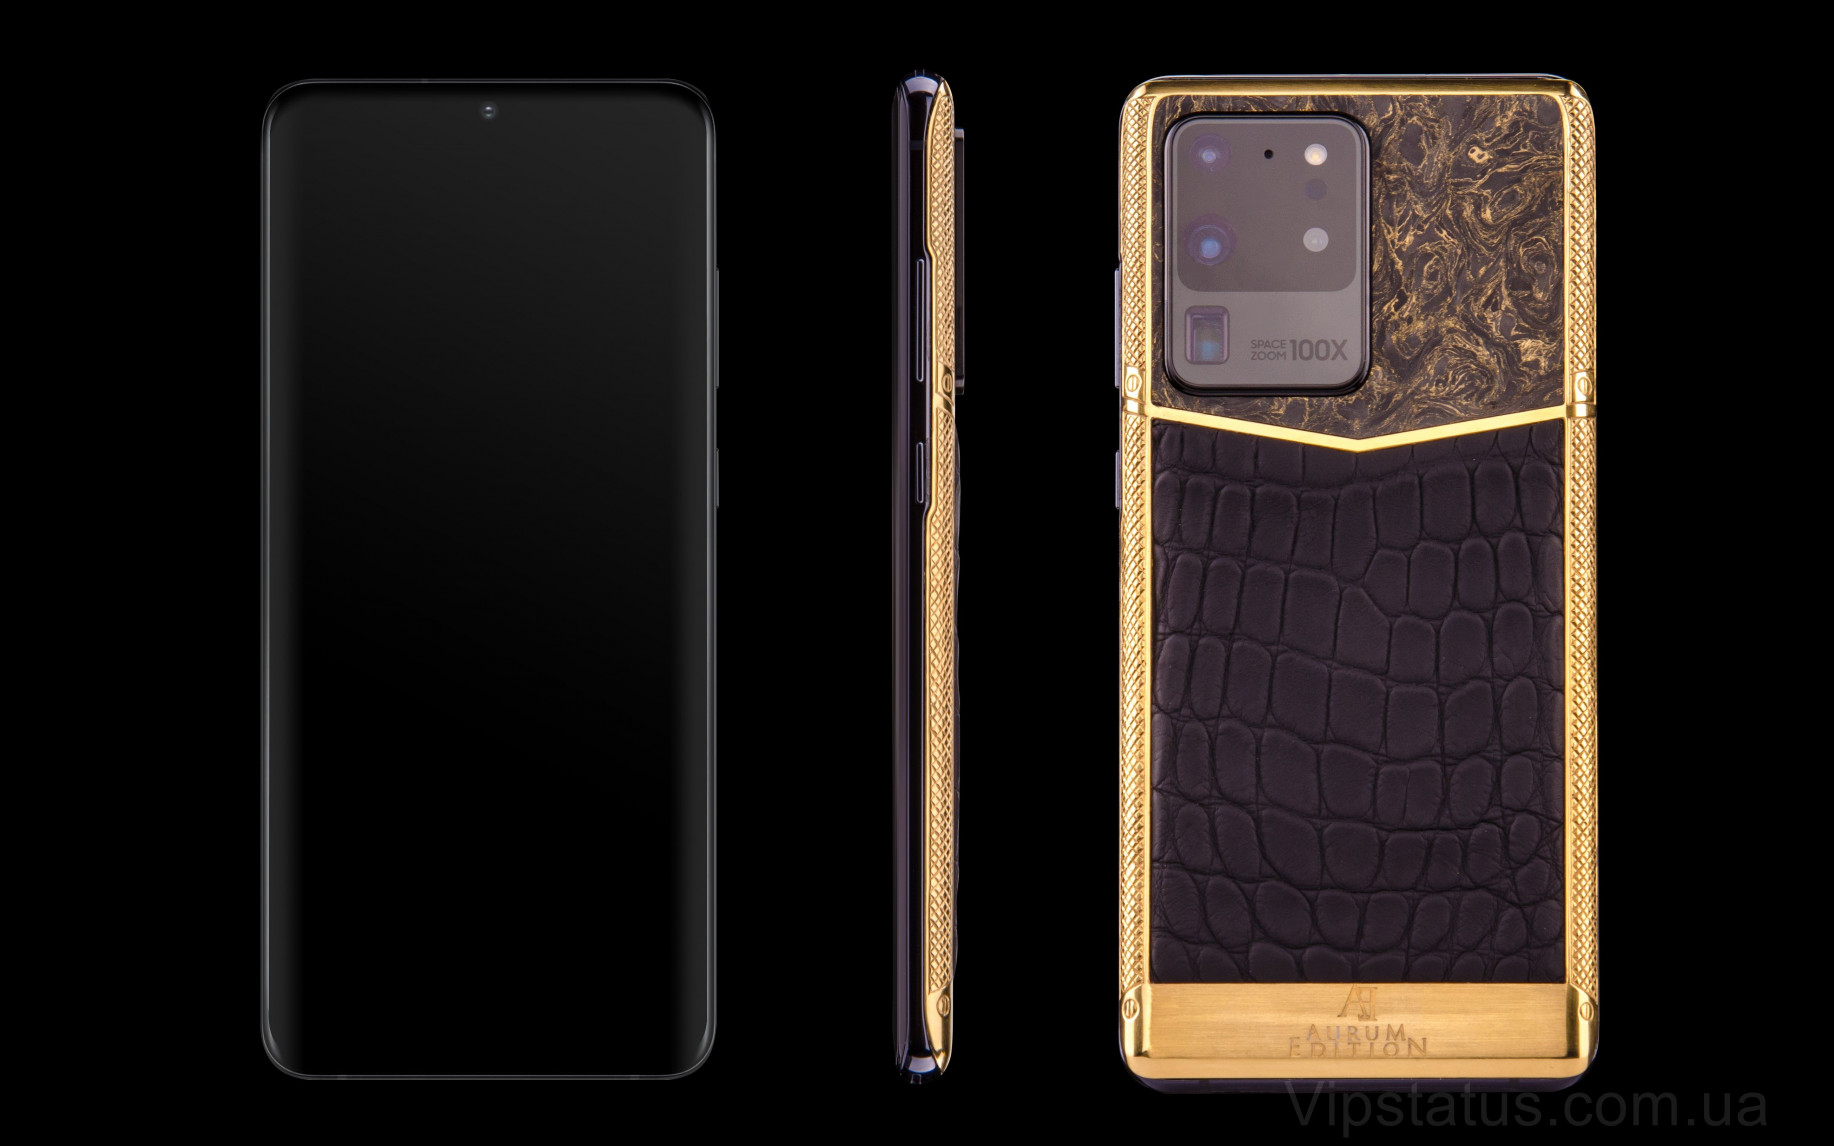 Elite Samsung S20 Gold Star Samsung S20 Gold Star image 14